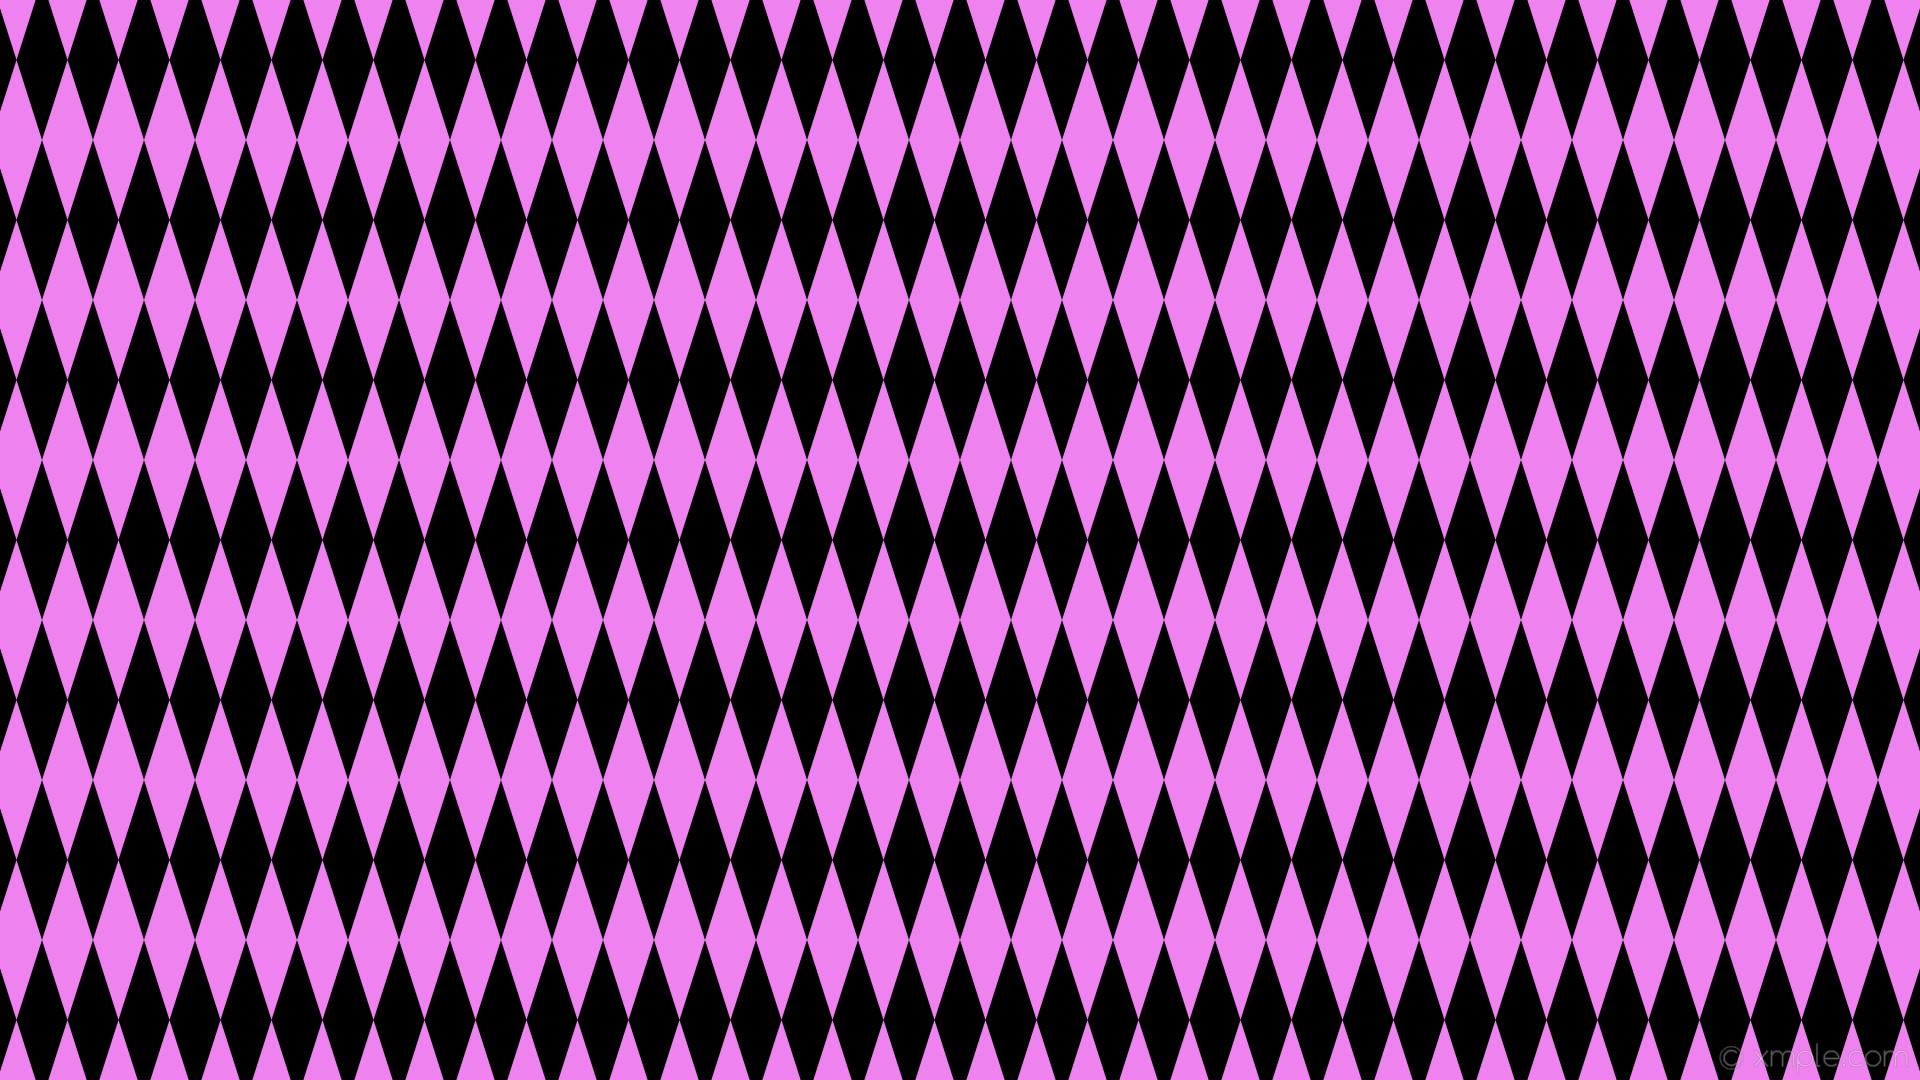 wallpaper rhombus black purple diamond lozenge violet #000000 #ee82ee 90°  160px 51px